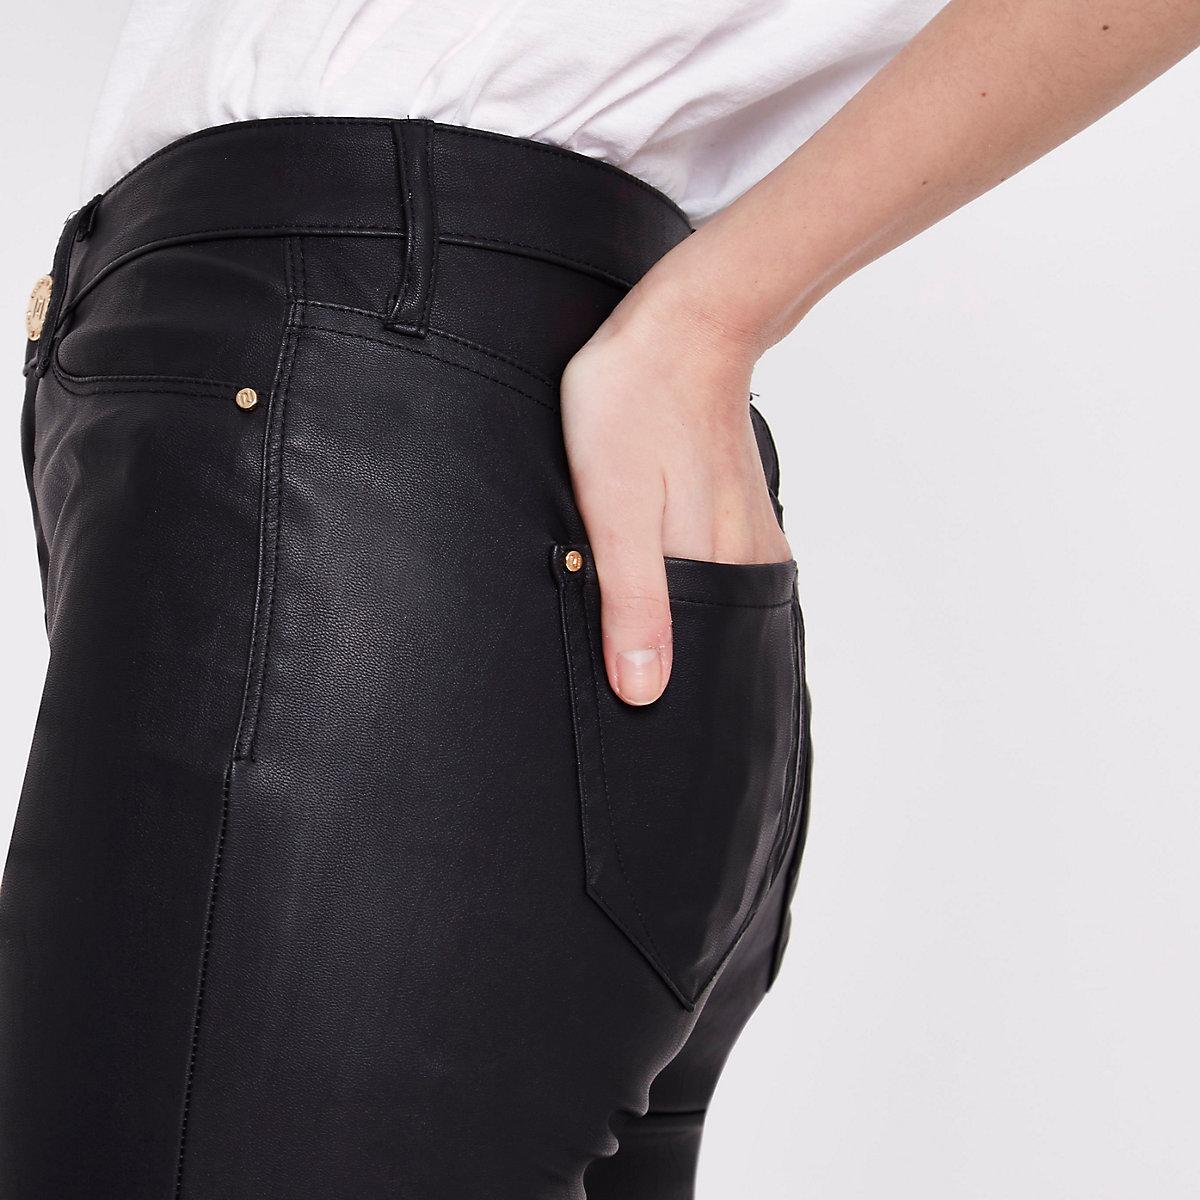 Molly – Schwarze Skinny Fit Hose aus Lederimitat - Skinny Fit Hosen ... 49e0118564